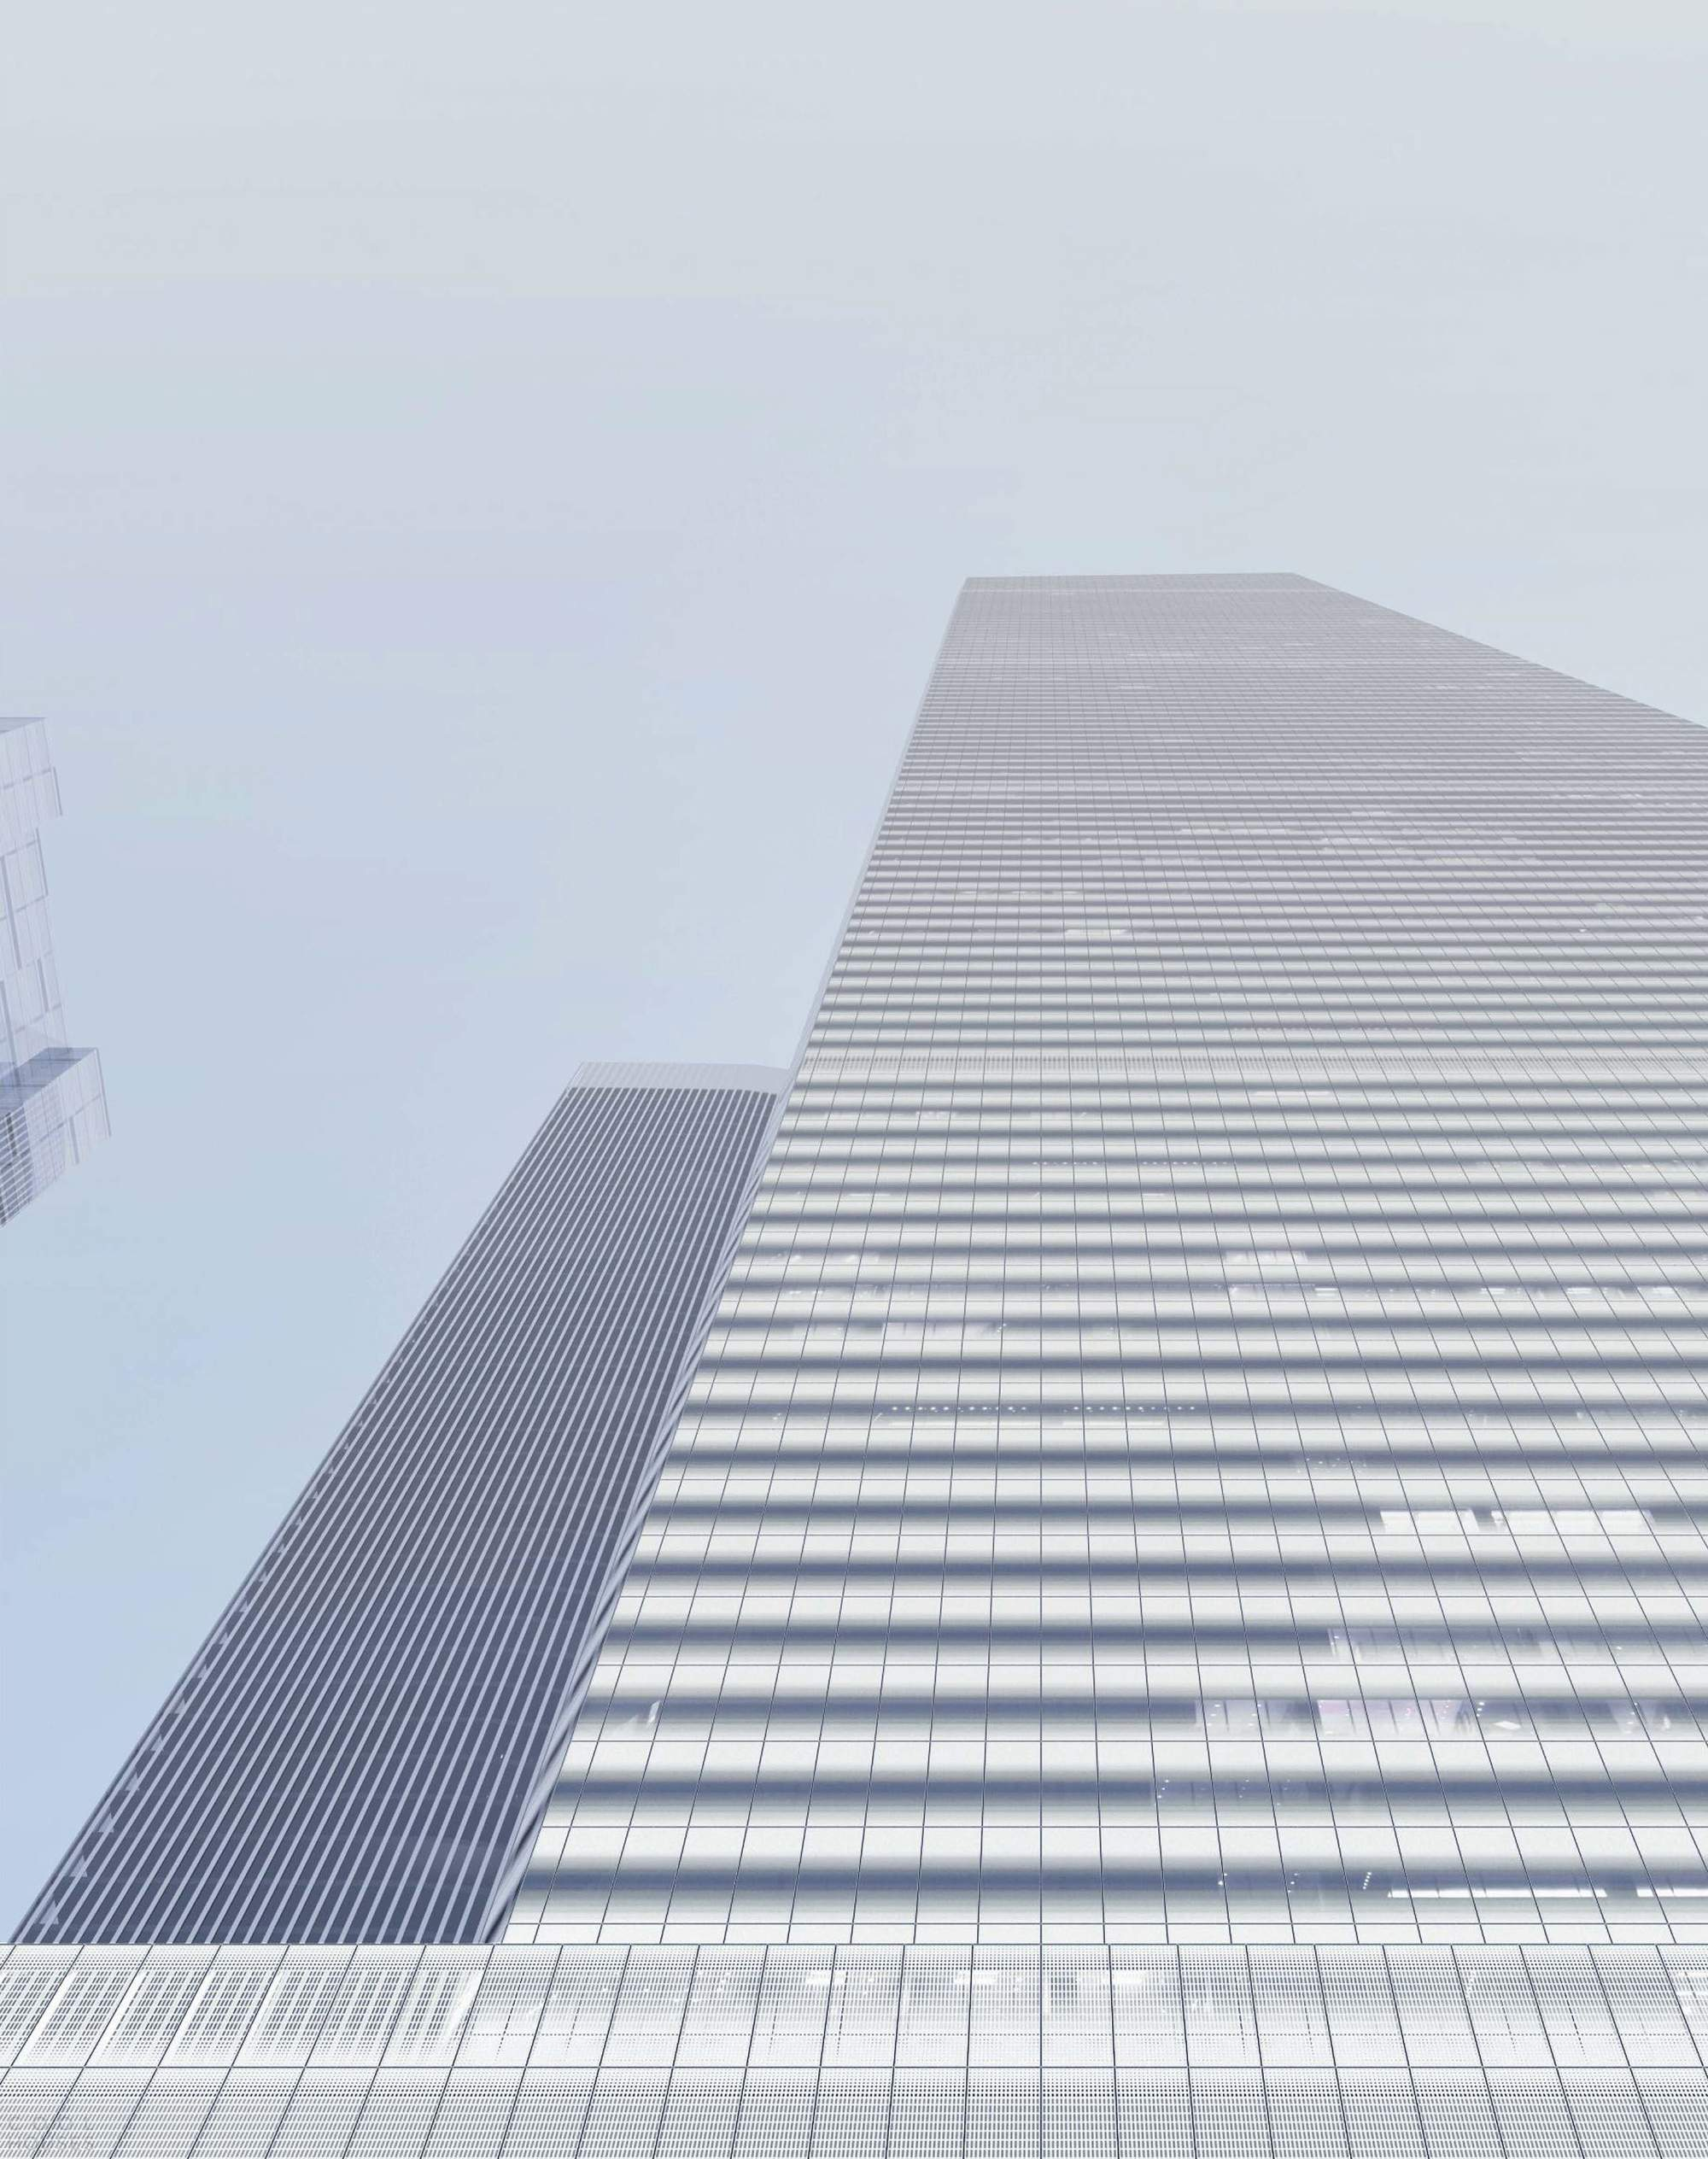 Новый небоскреб в ММДЦ «Москва - Сити», Москва, Россия